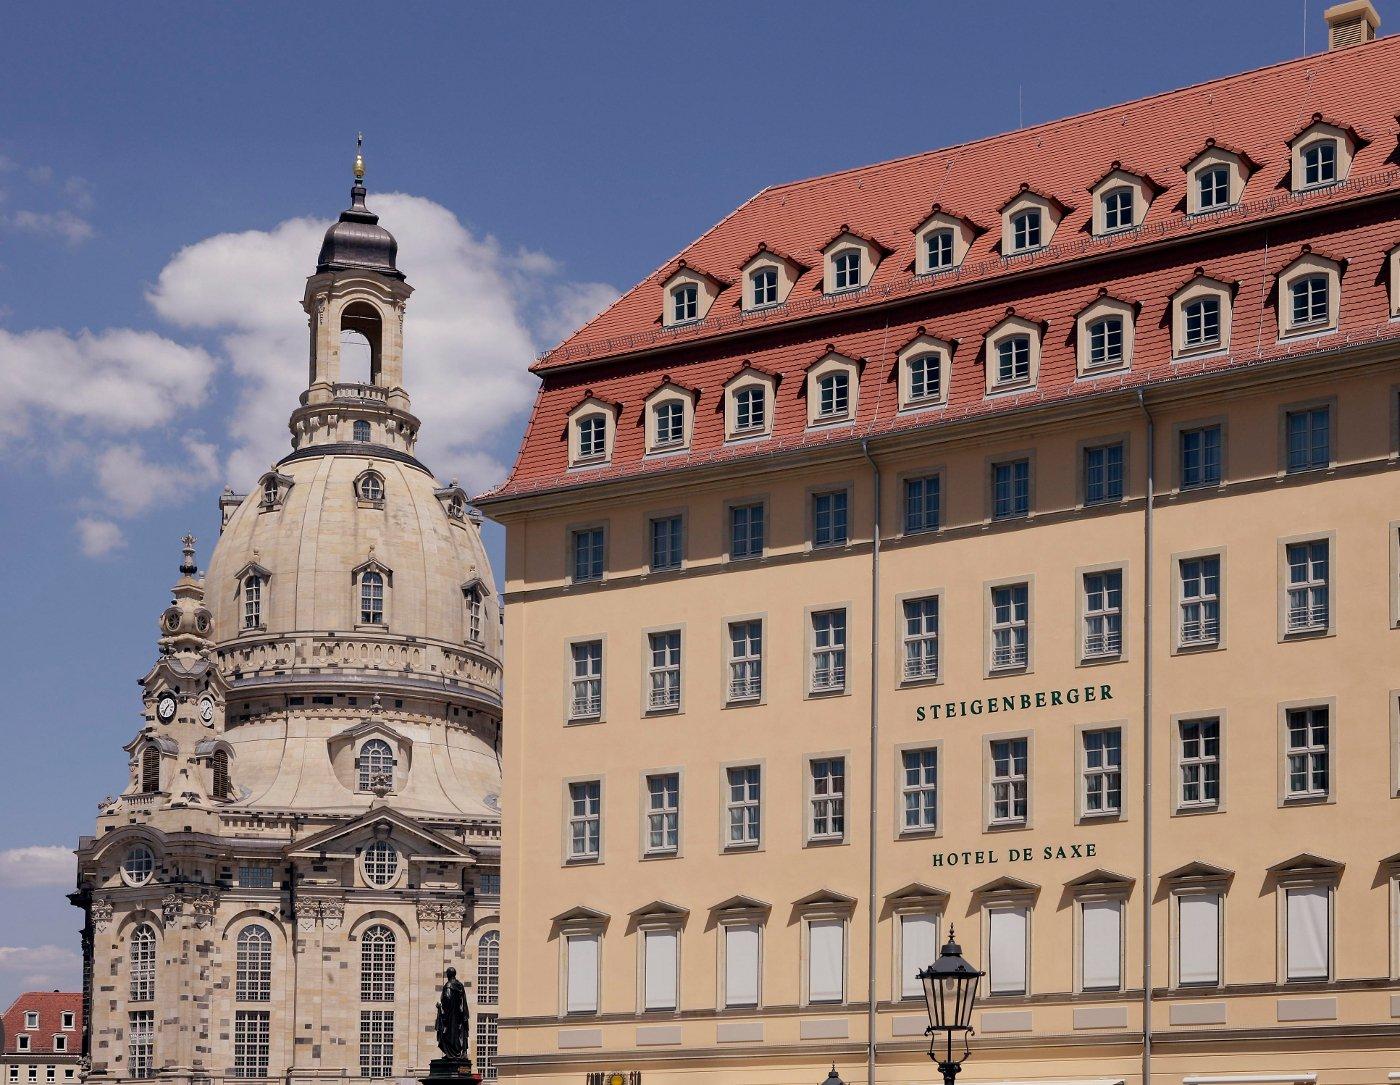 Silvester in dresden zeit reisen for Dresden hotel zentrum